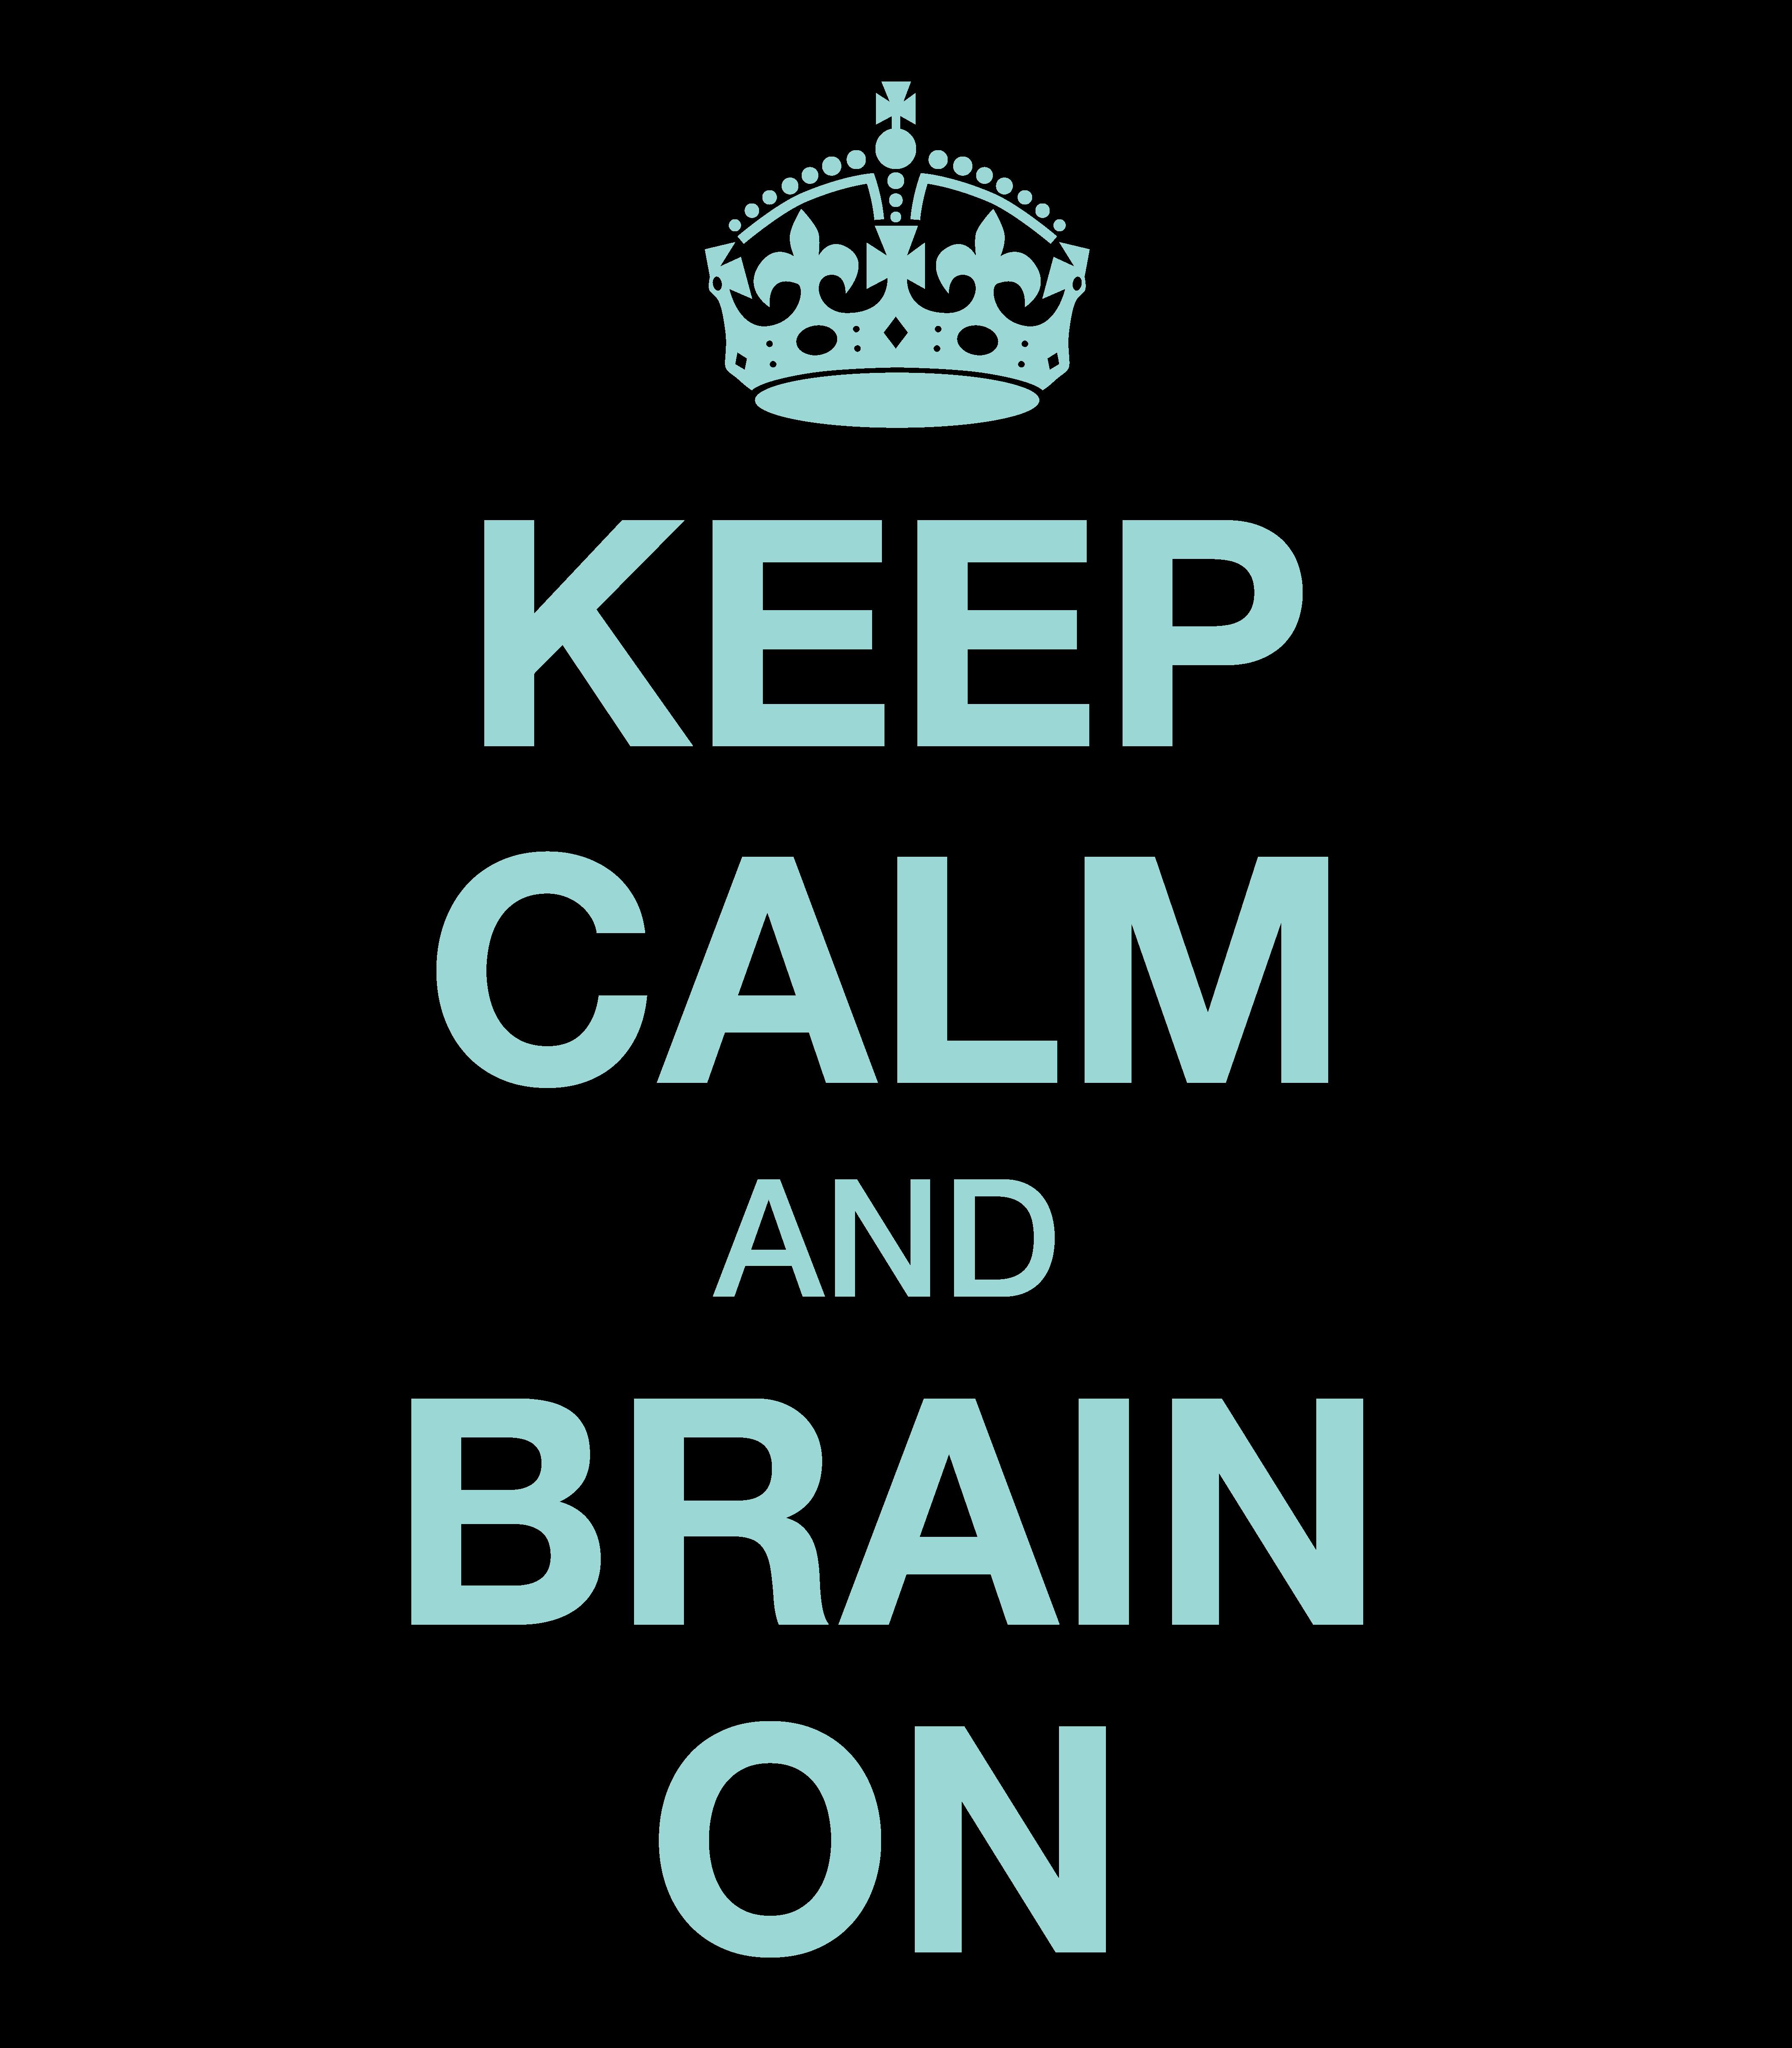 Keep calm and brain on